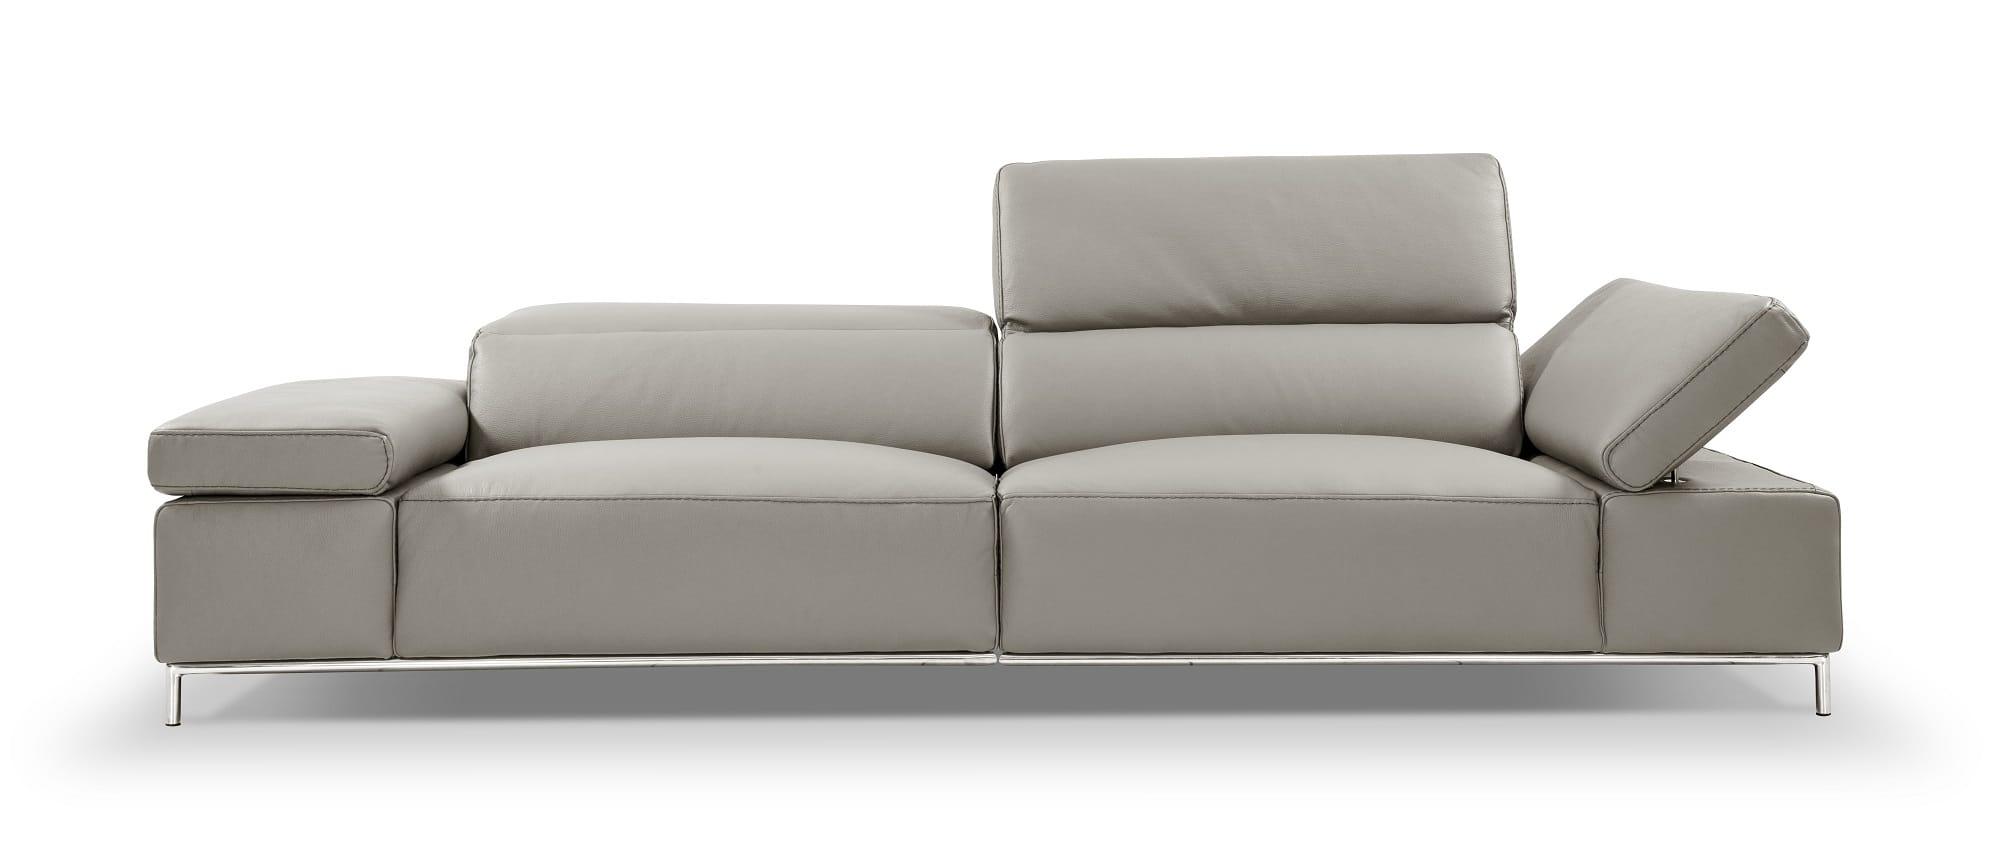 I800 Light Grey Leather Sofa by J&M Furniture